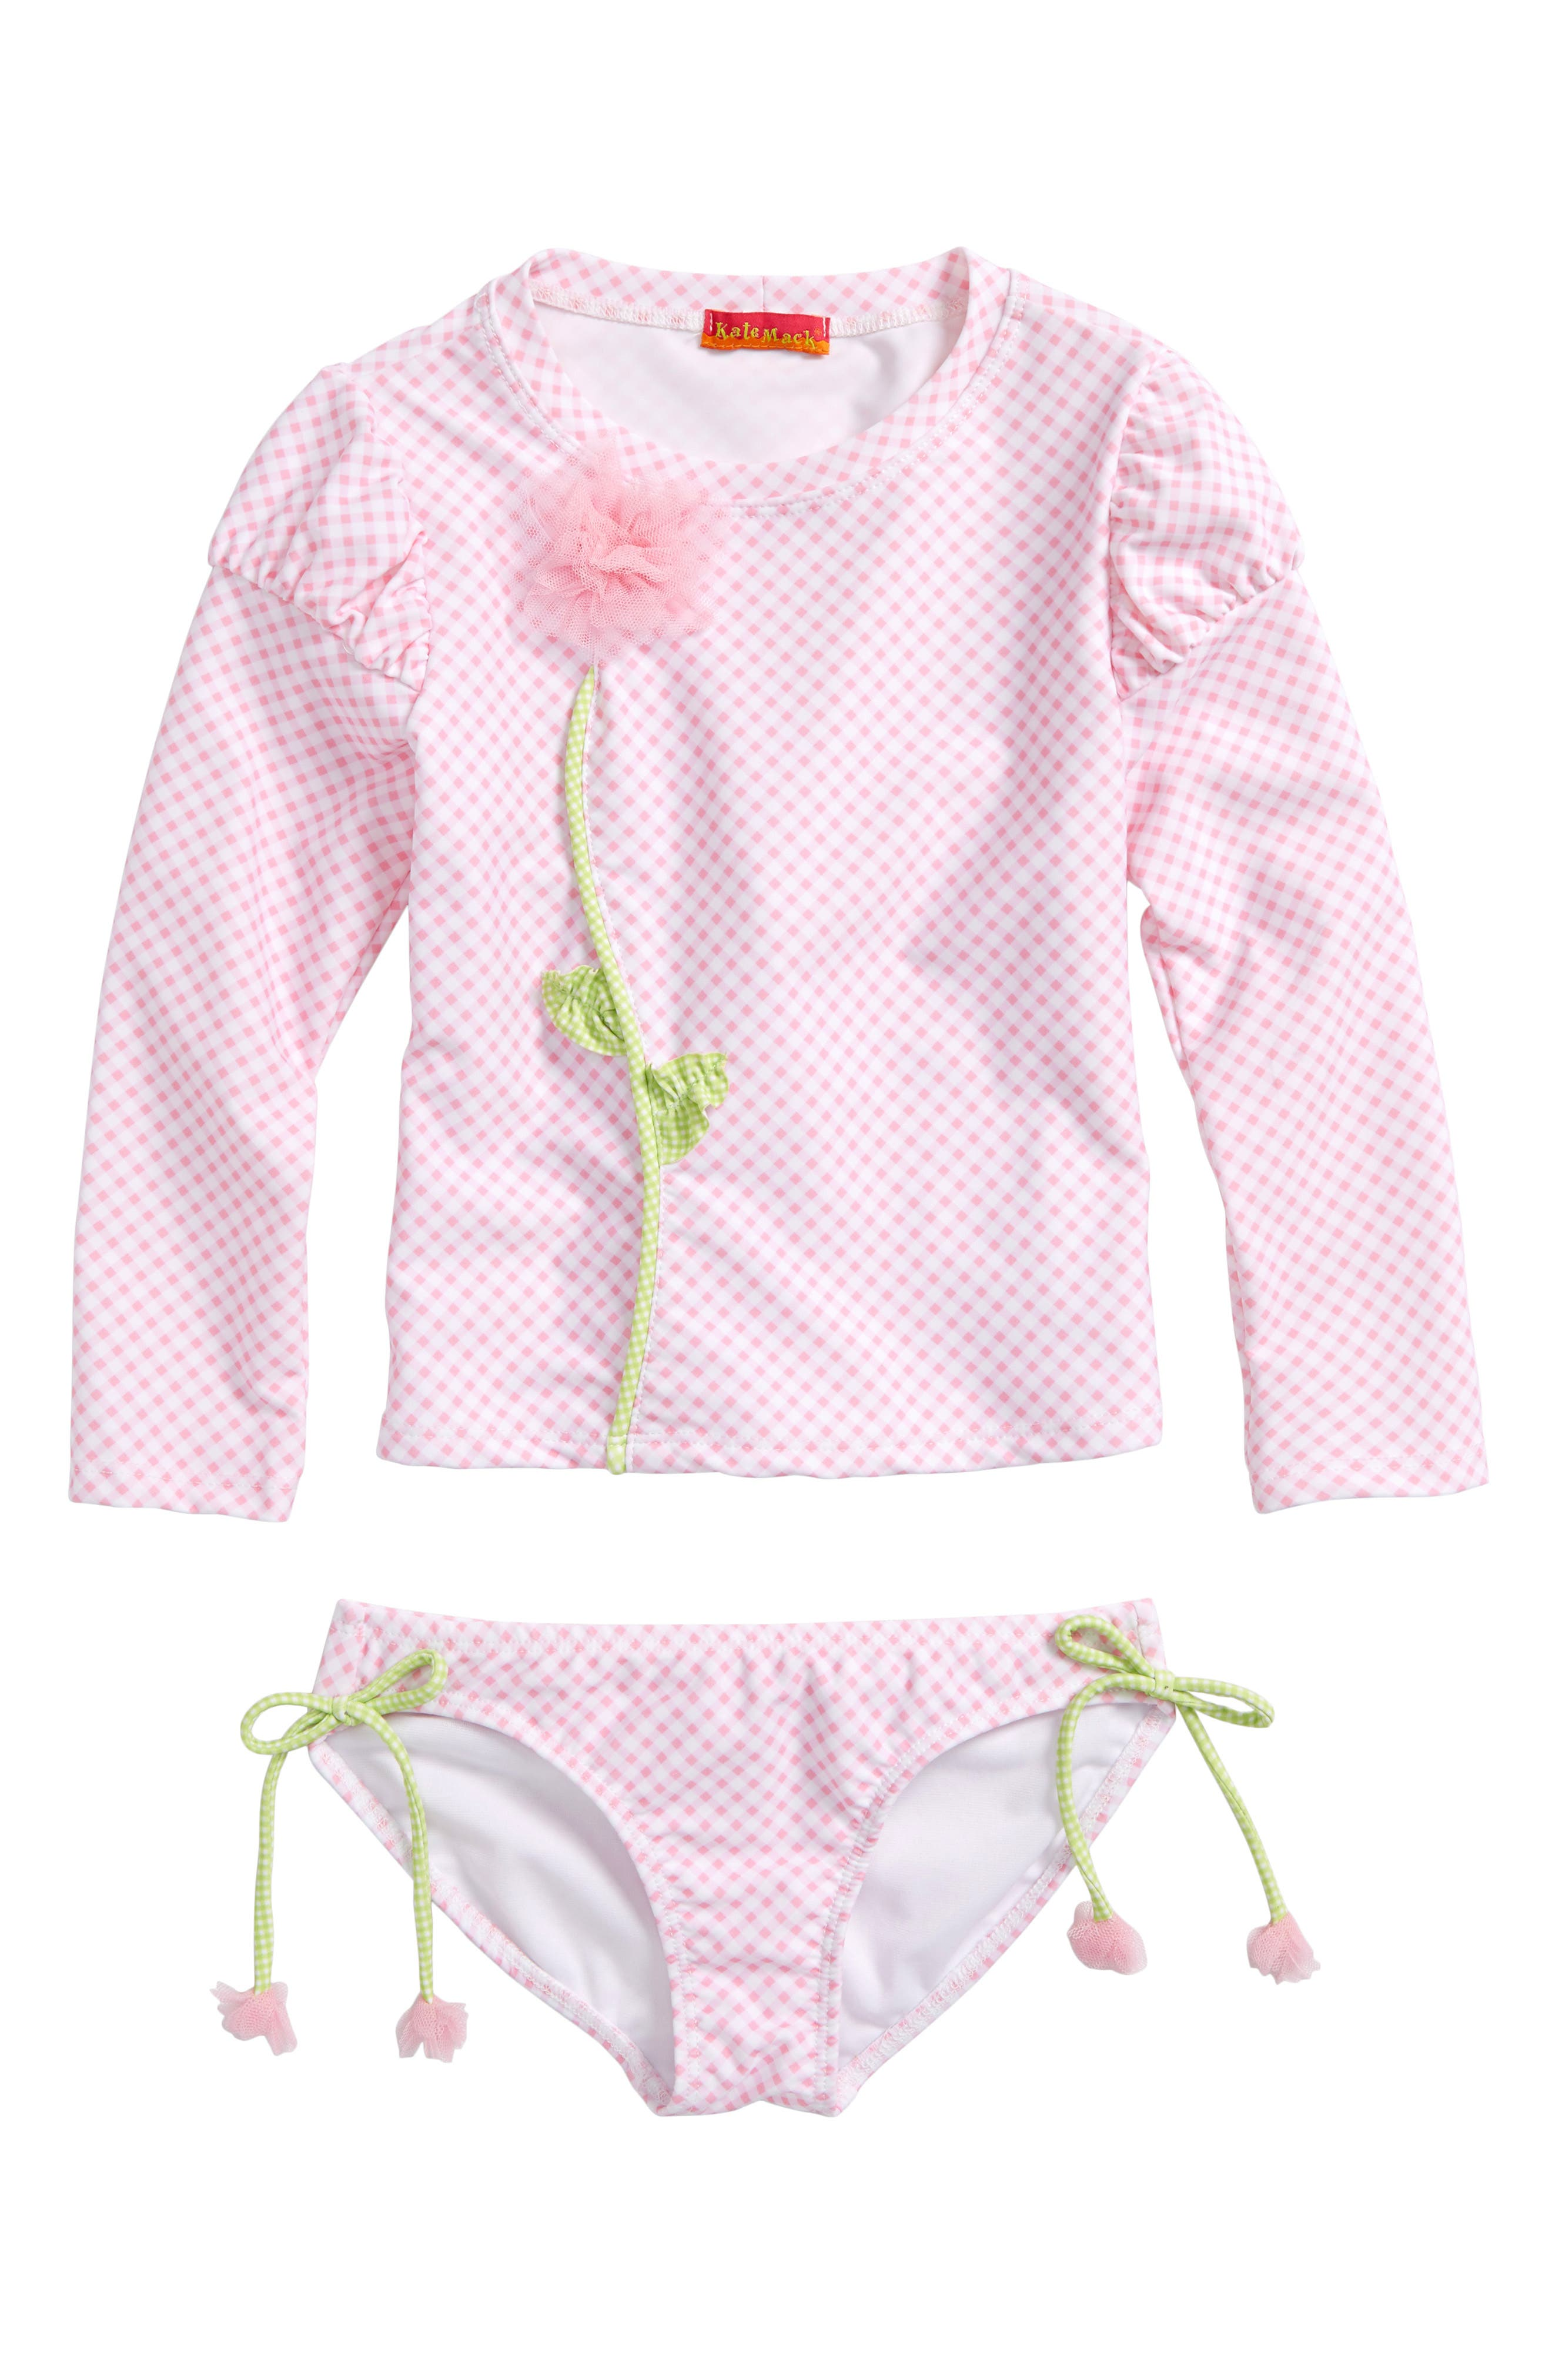 Gingham Two-Piece Rashguard Swimsuit,                             Main thumbnail 1, color,                             650